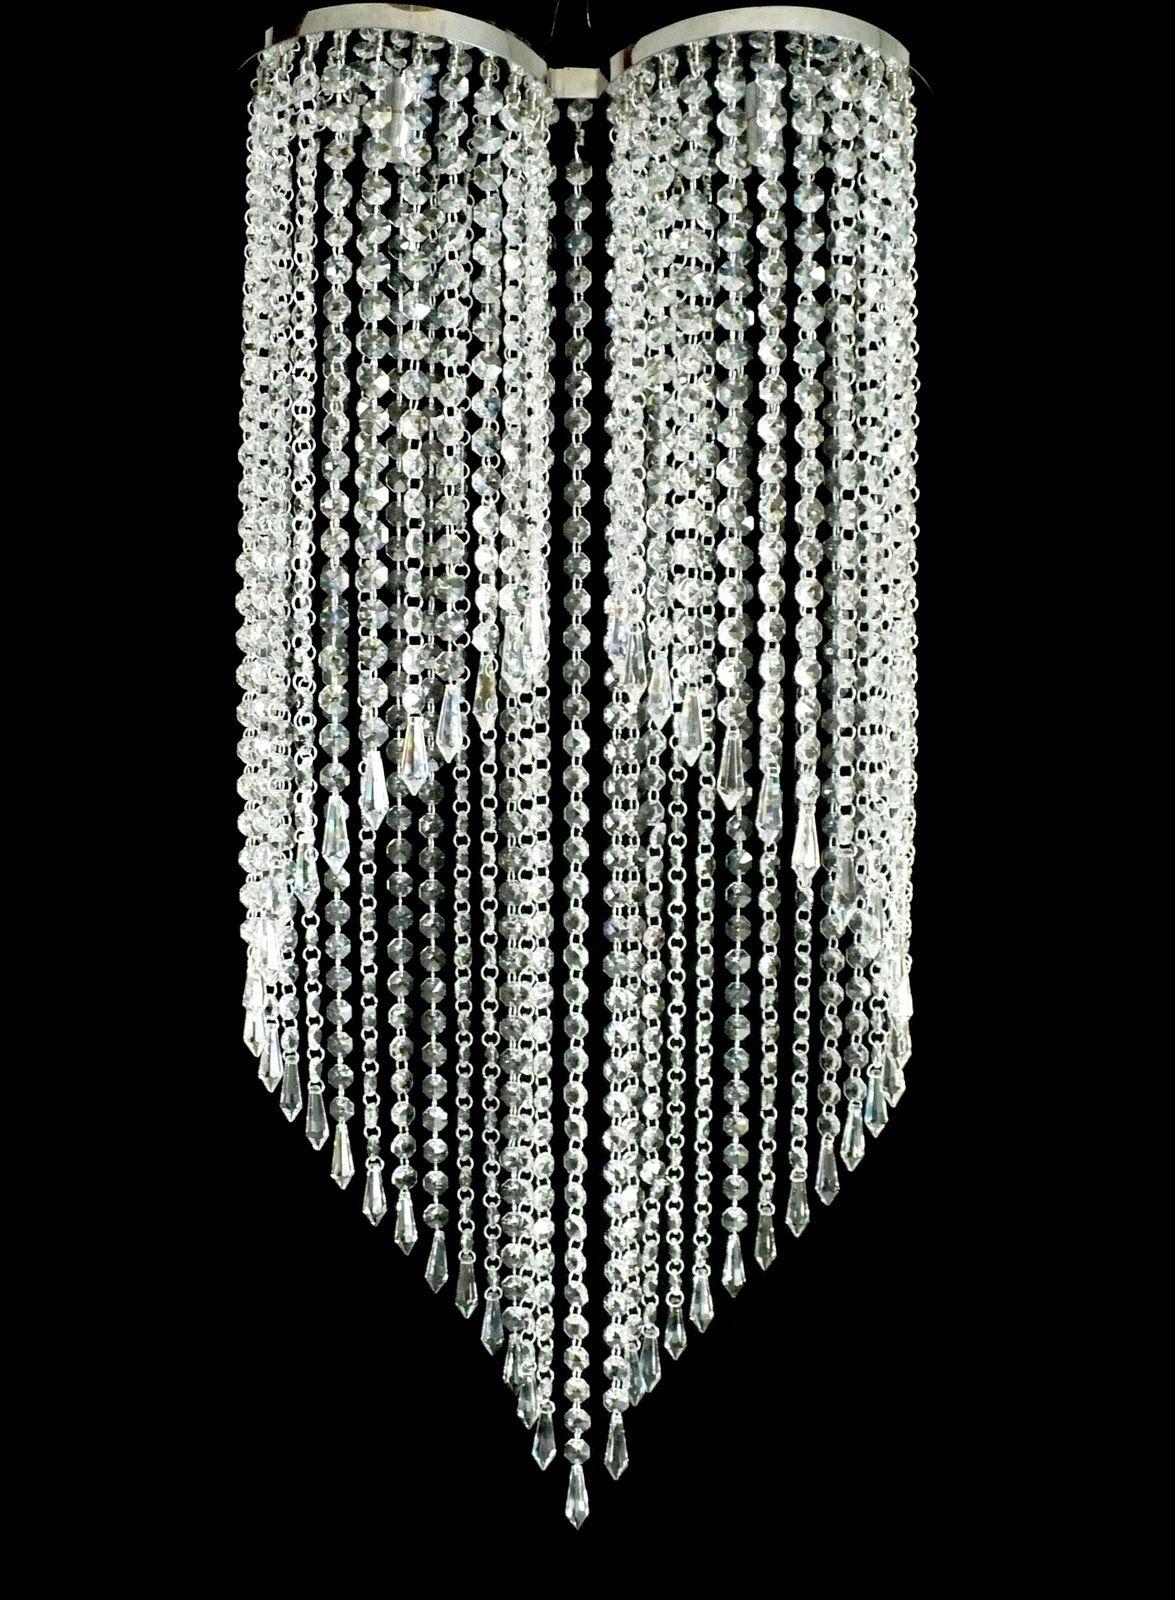 lustre de cristal chique lustres e luminarias pinterest lustres de cristal lustres e chique. Black Bedroom Furniture Sets. Home Design Ideas